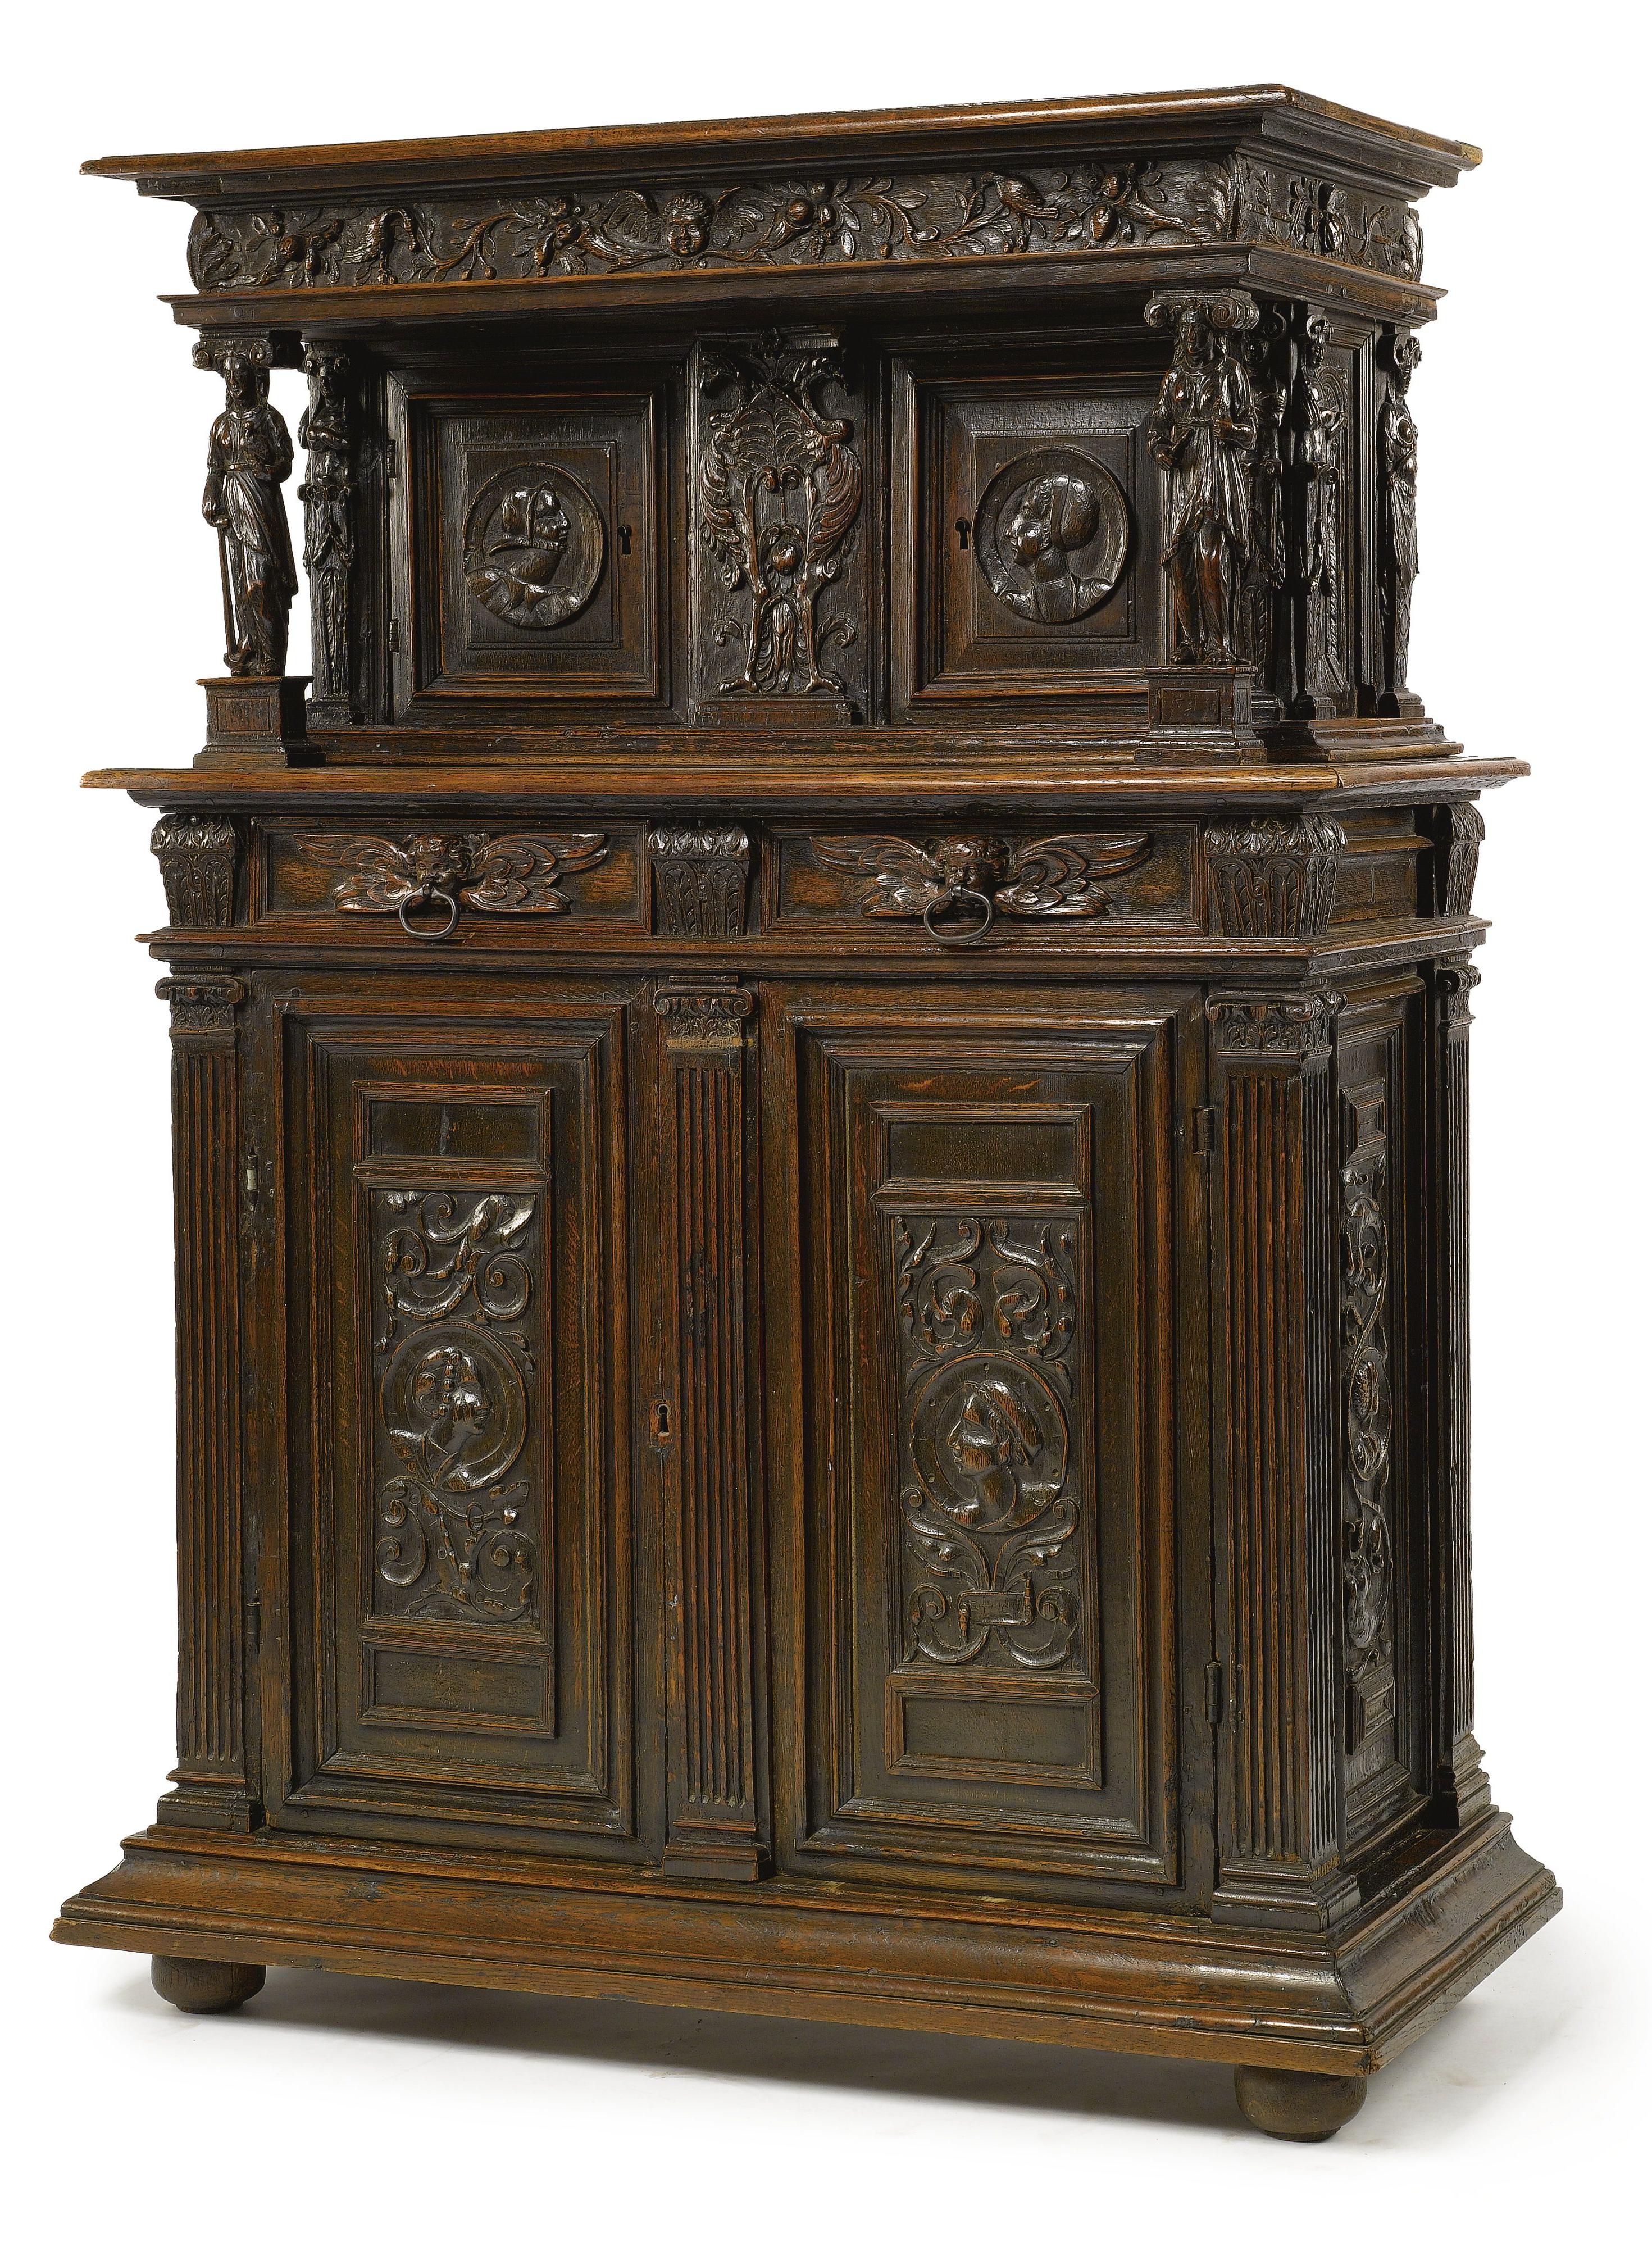 A Flemish Late Renaissance Carved Oak Buffet À Deux Corps Regarding Cambrai Sideboards (View 20 of 20)